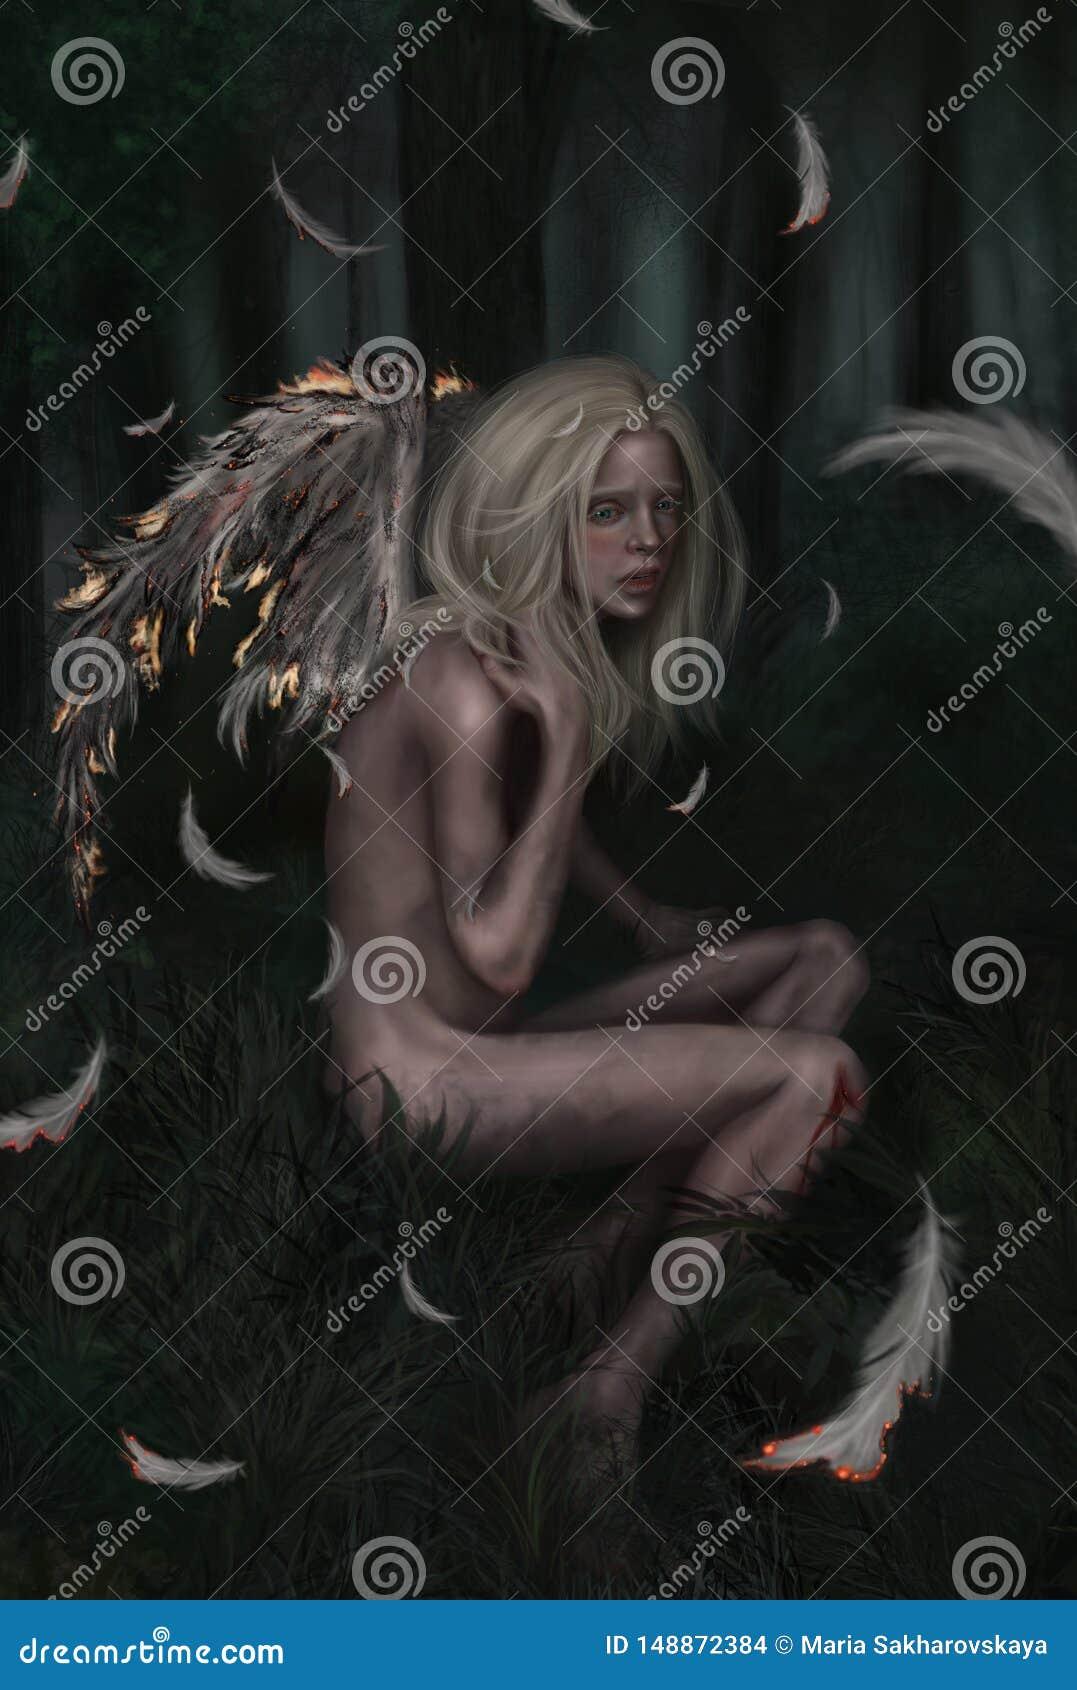 A little fallen angel